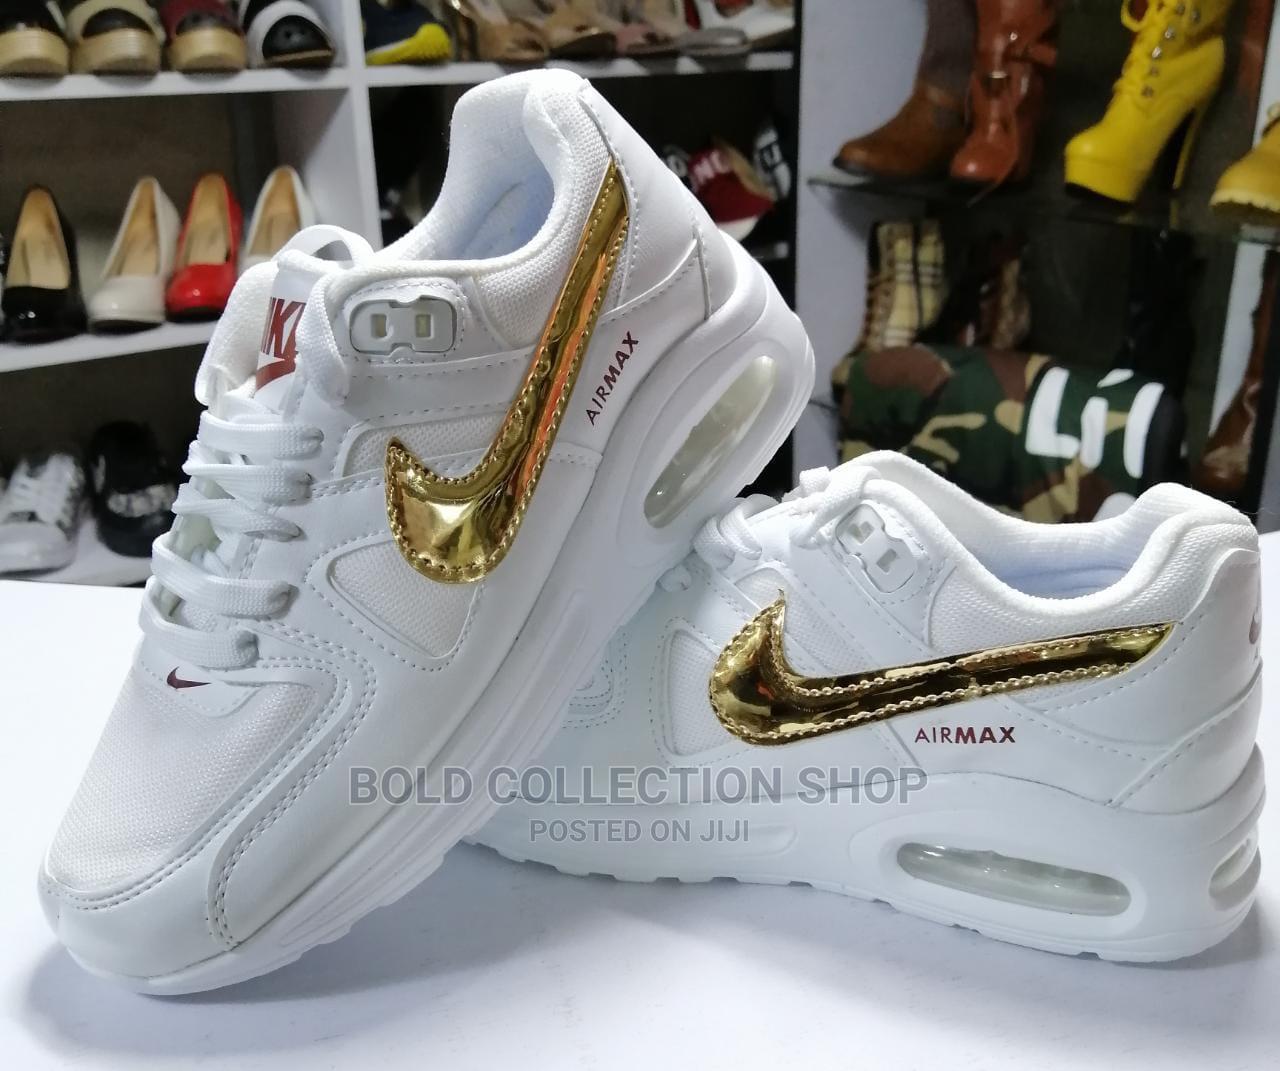 Nike Airmax Sneakers